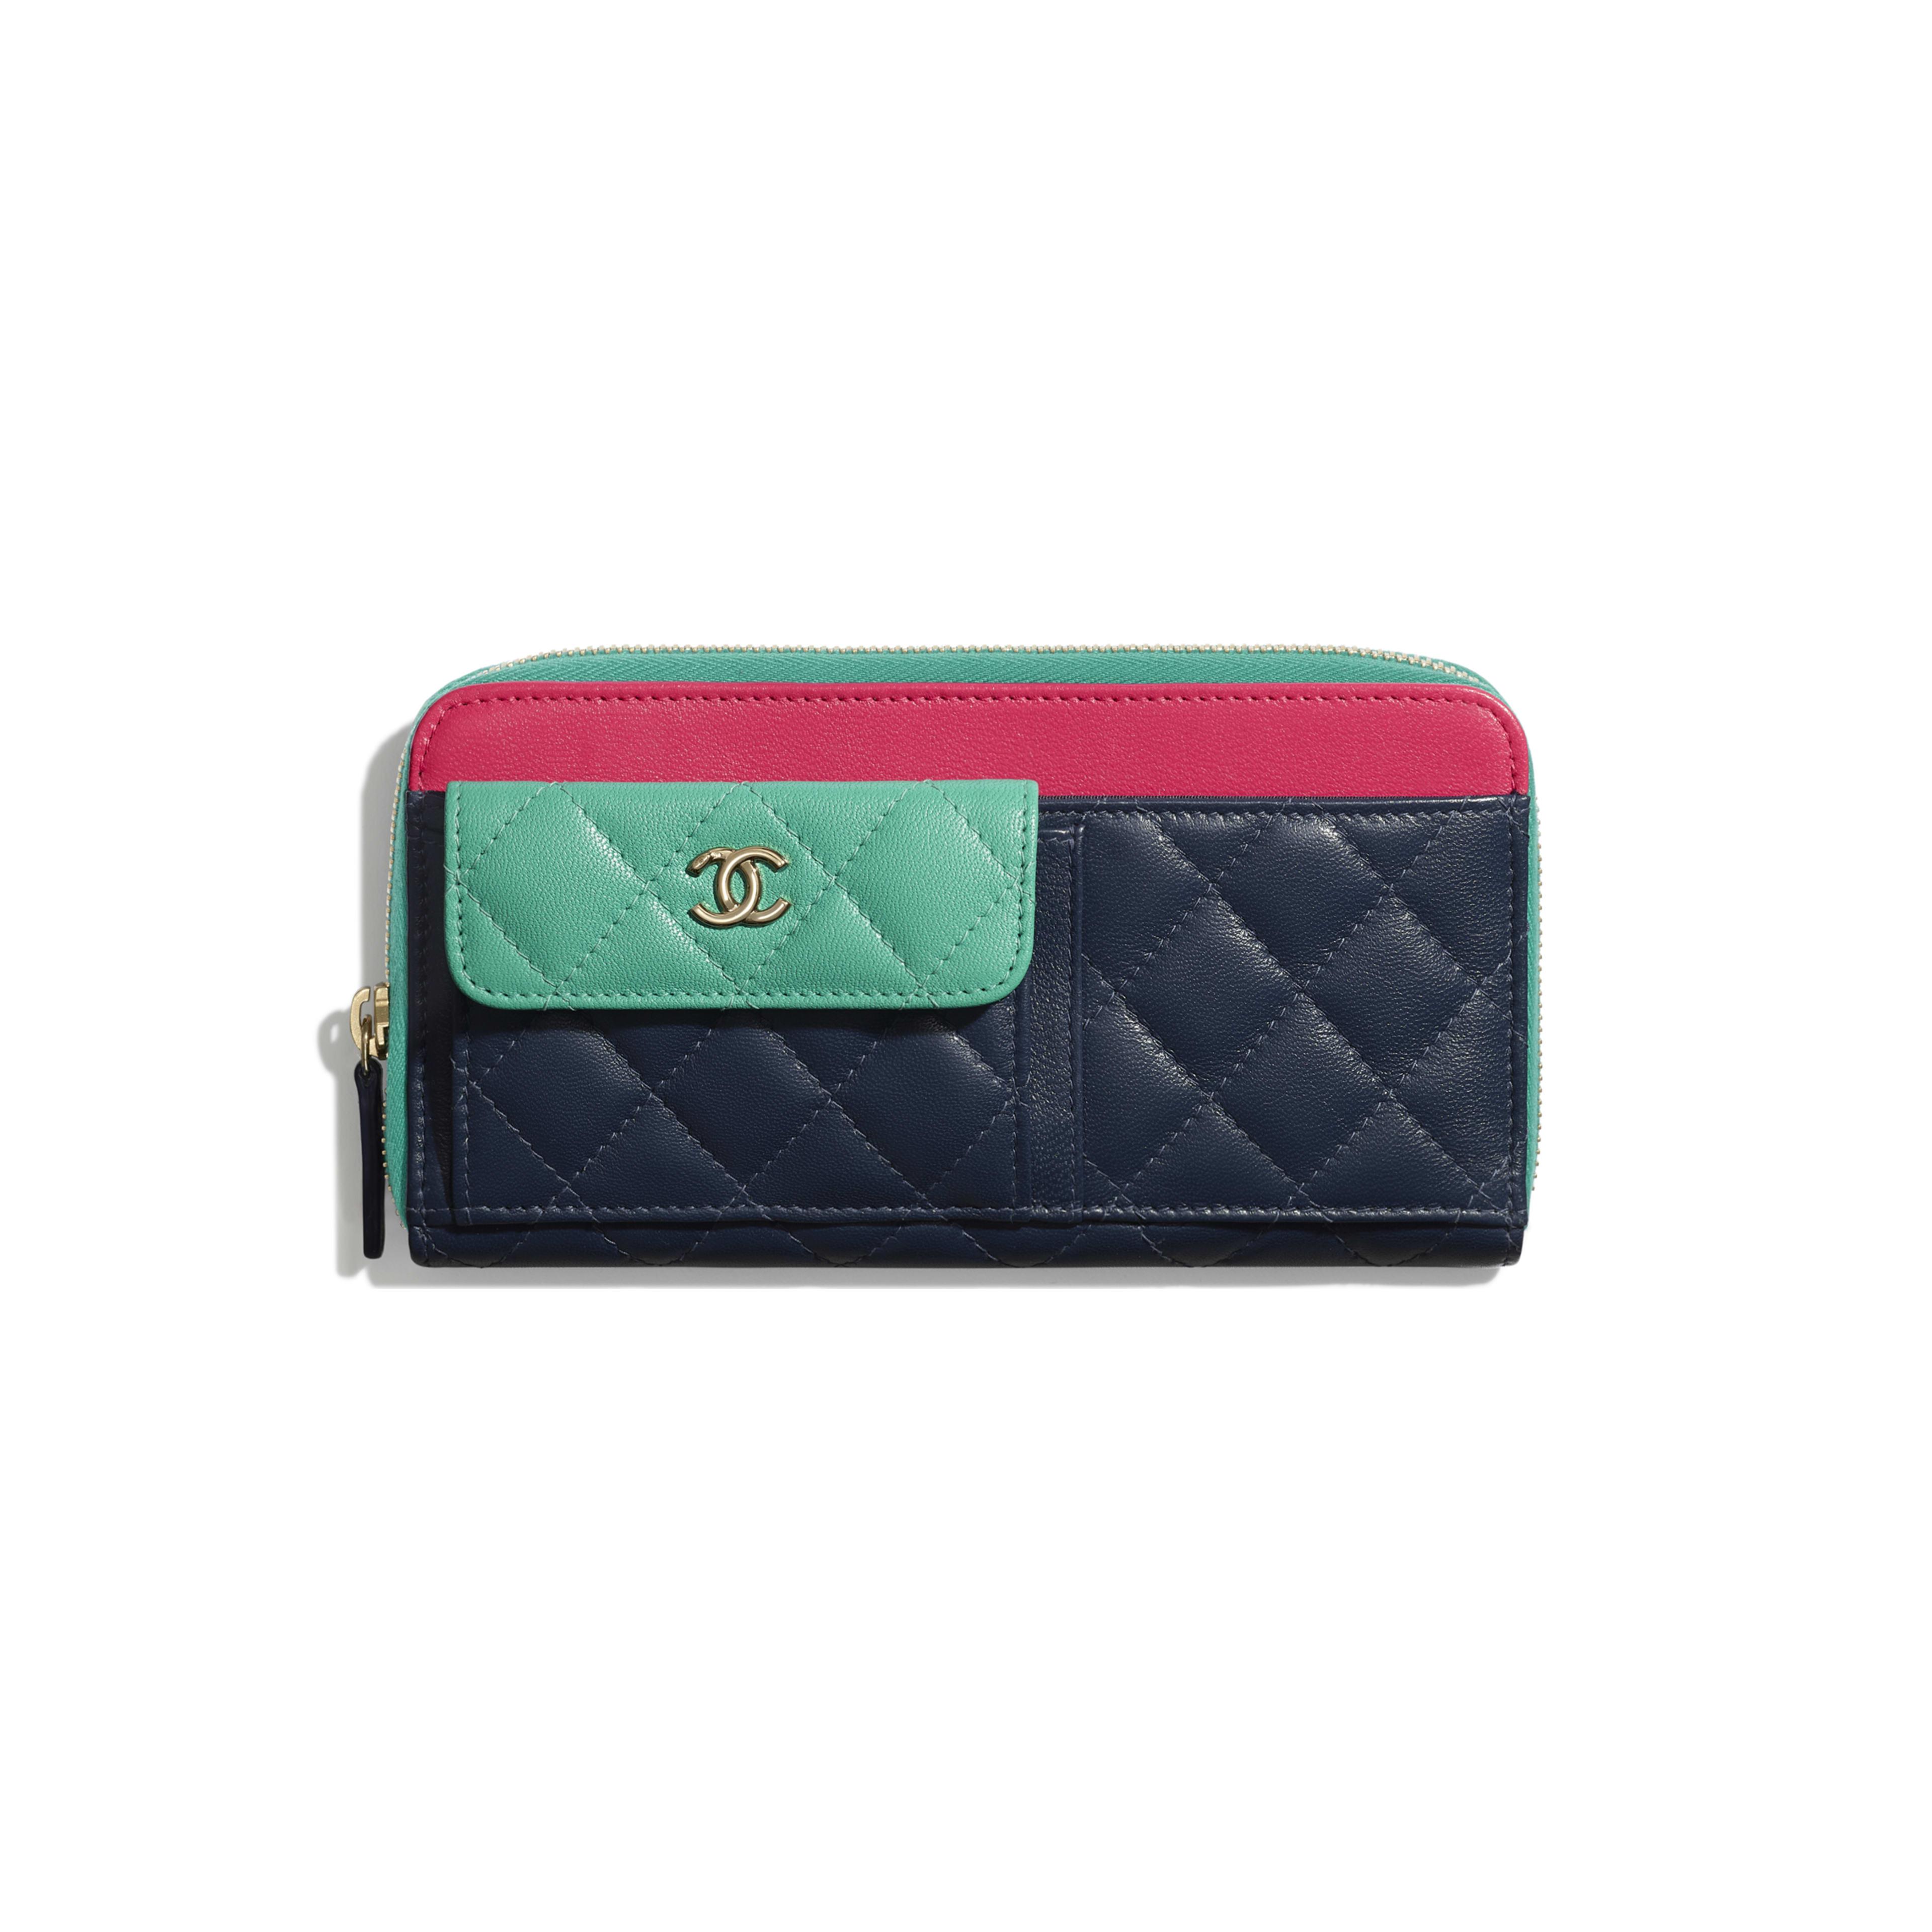 Long Zipped Wallet - Navy Blue, Green & Dark Pink - Goatskin & Gold-Tone Metal - Default view - see full sized version